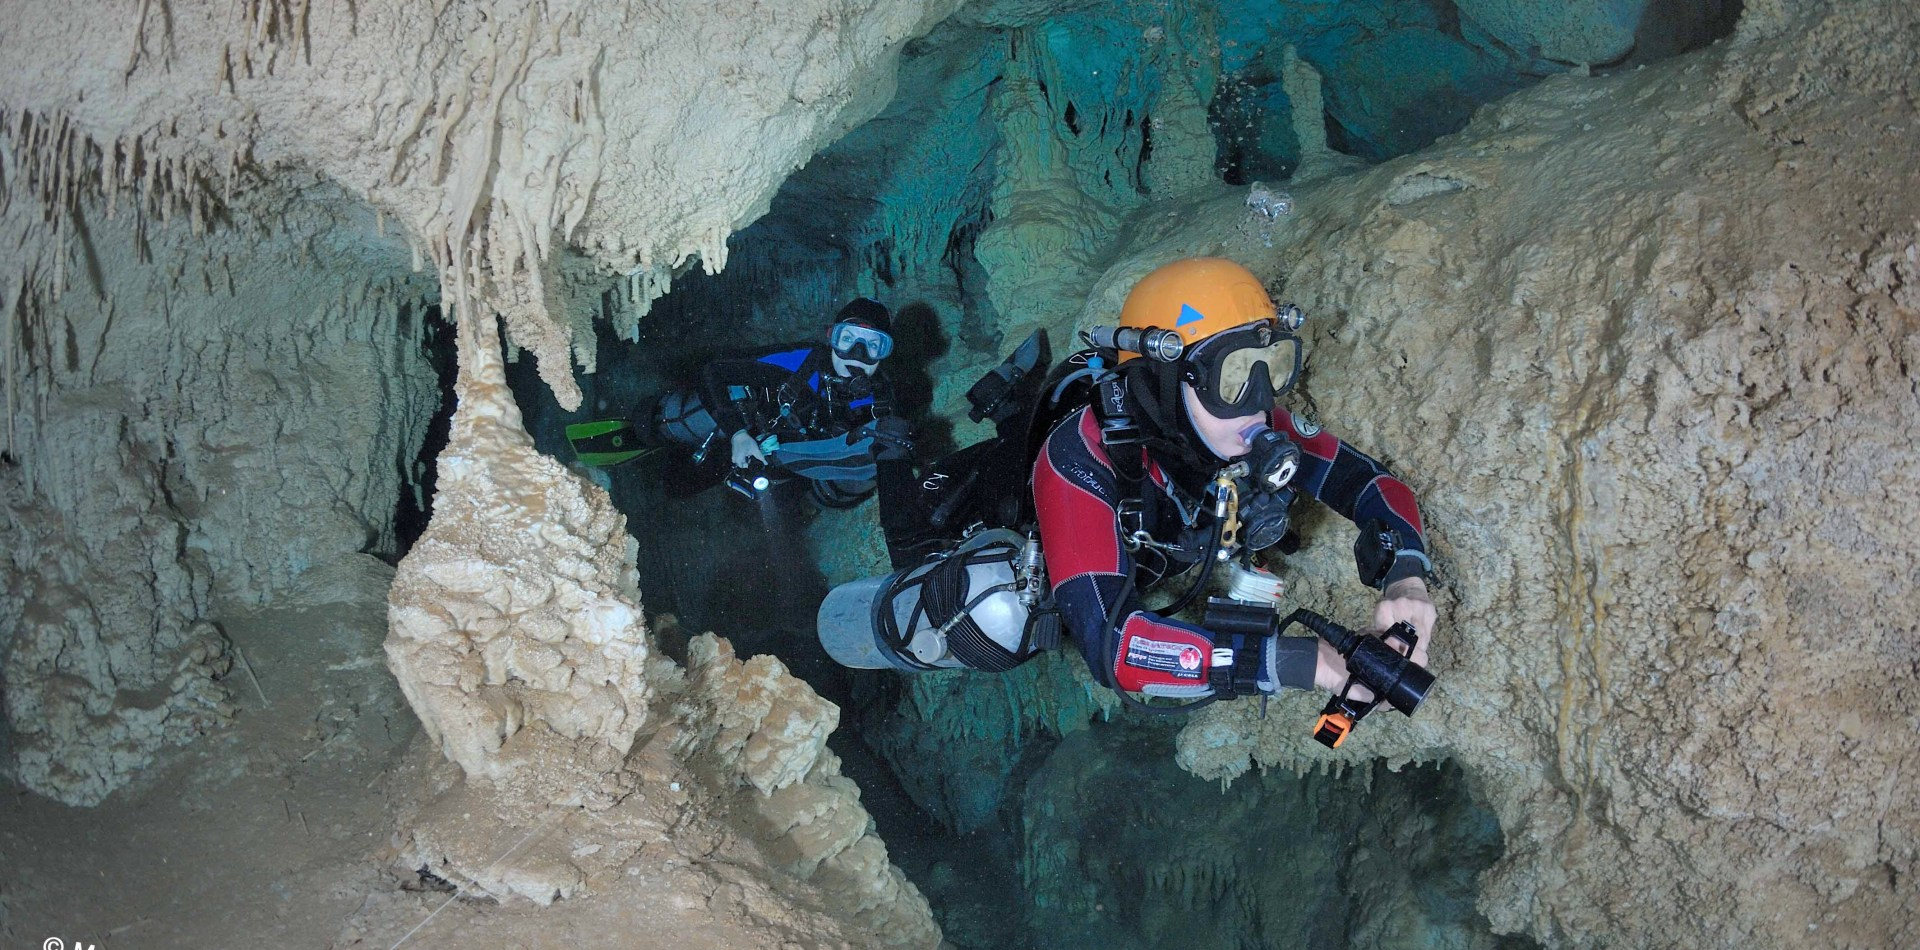 DeepBubbles - Cave - Technical - Rebreather Training